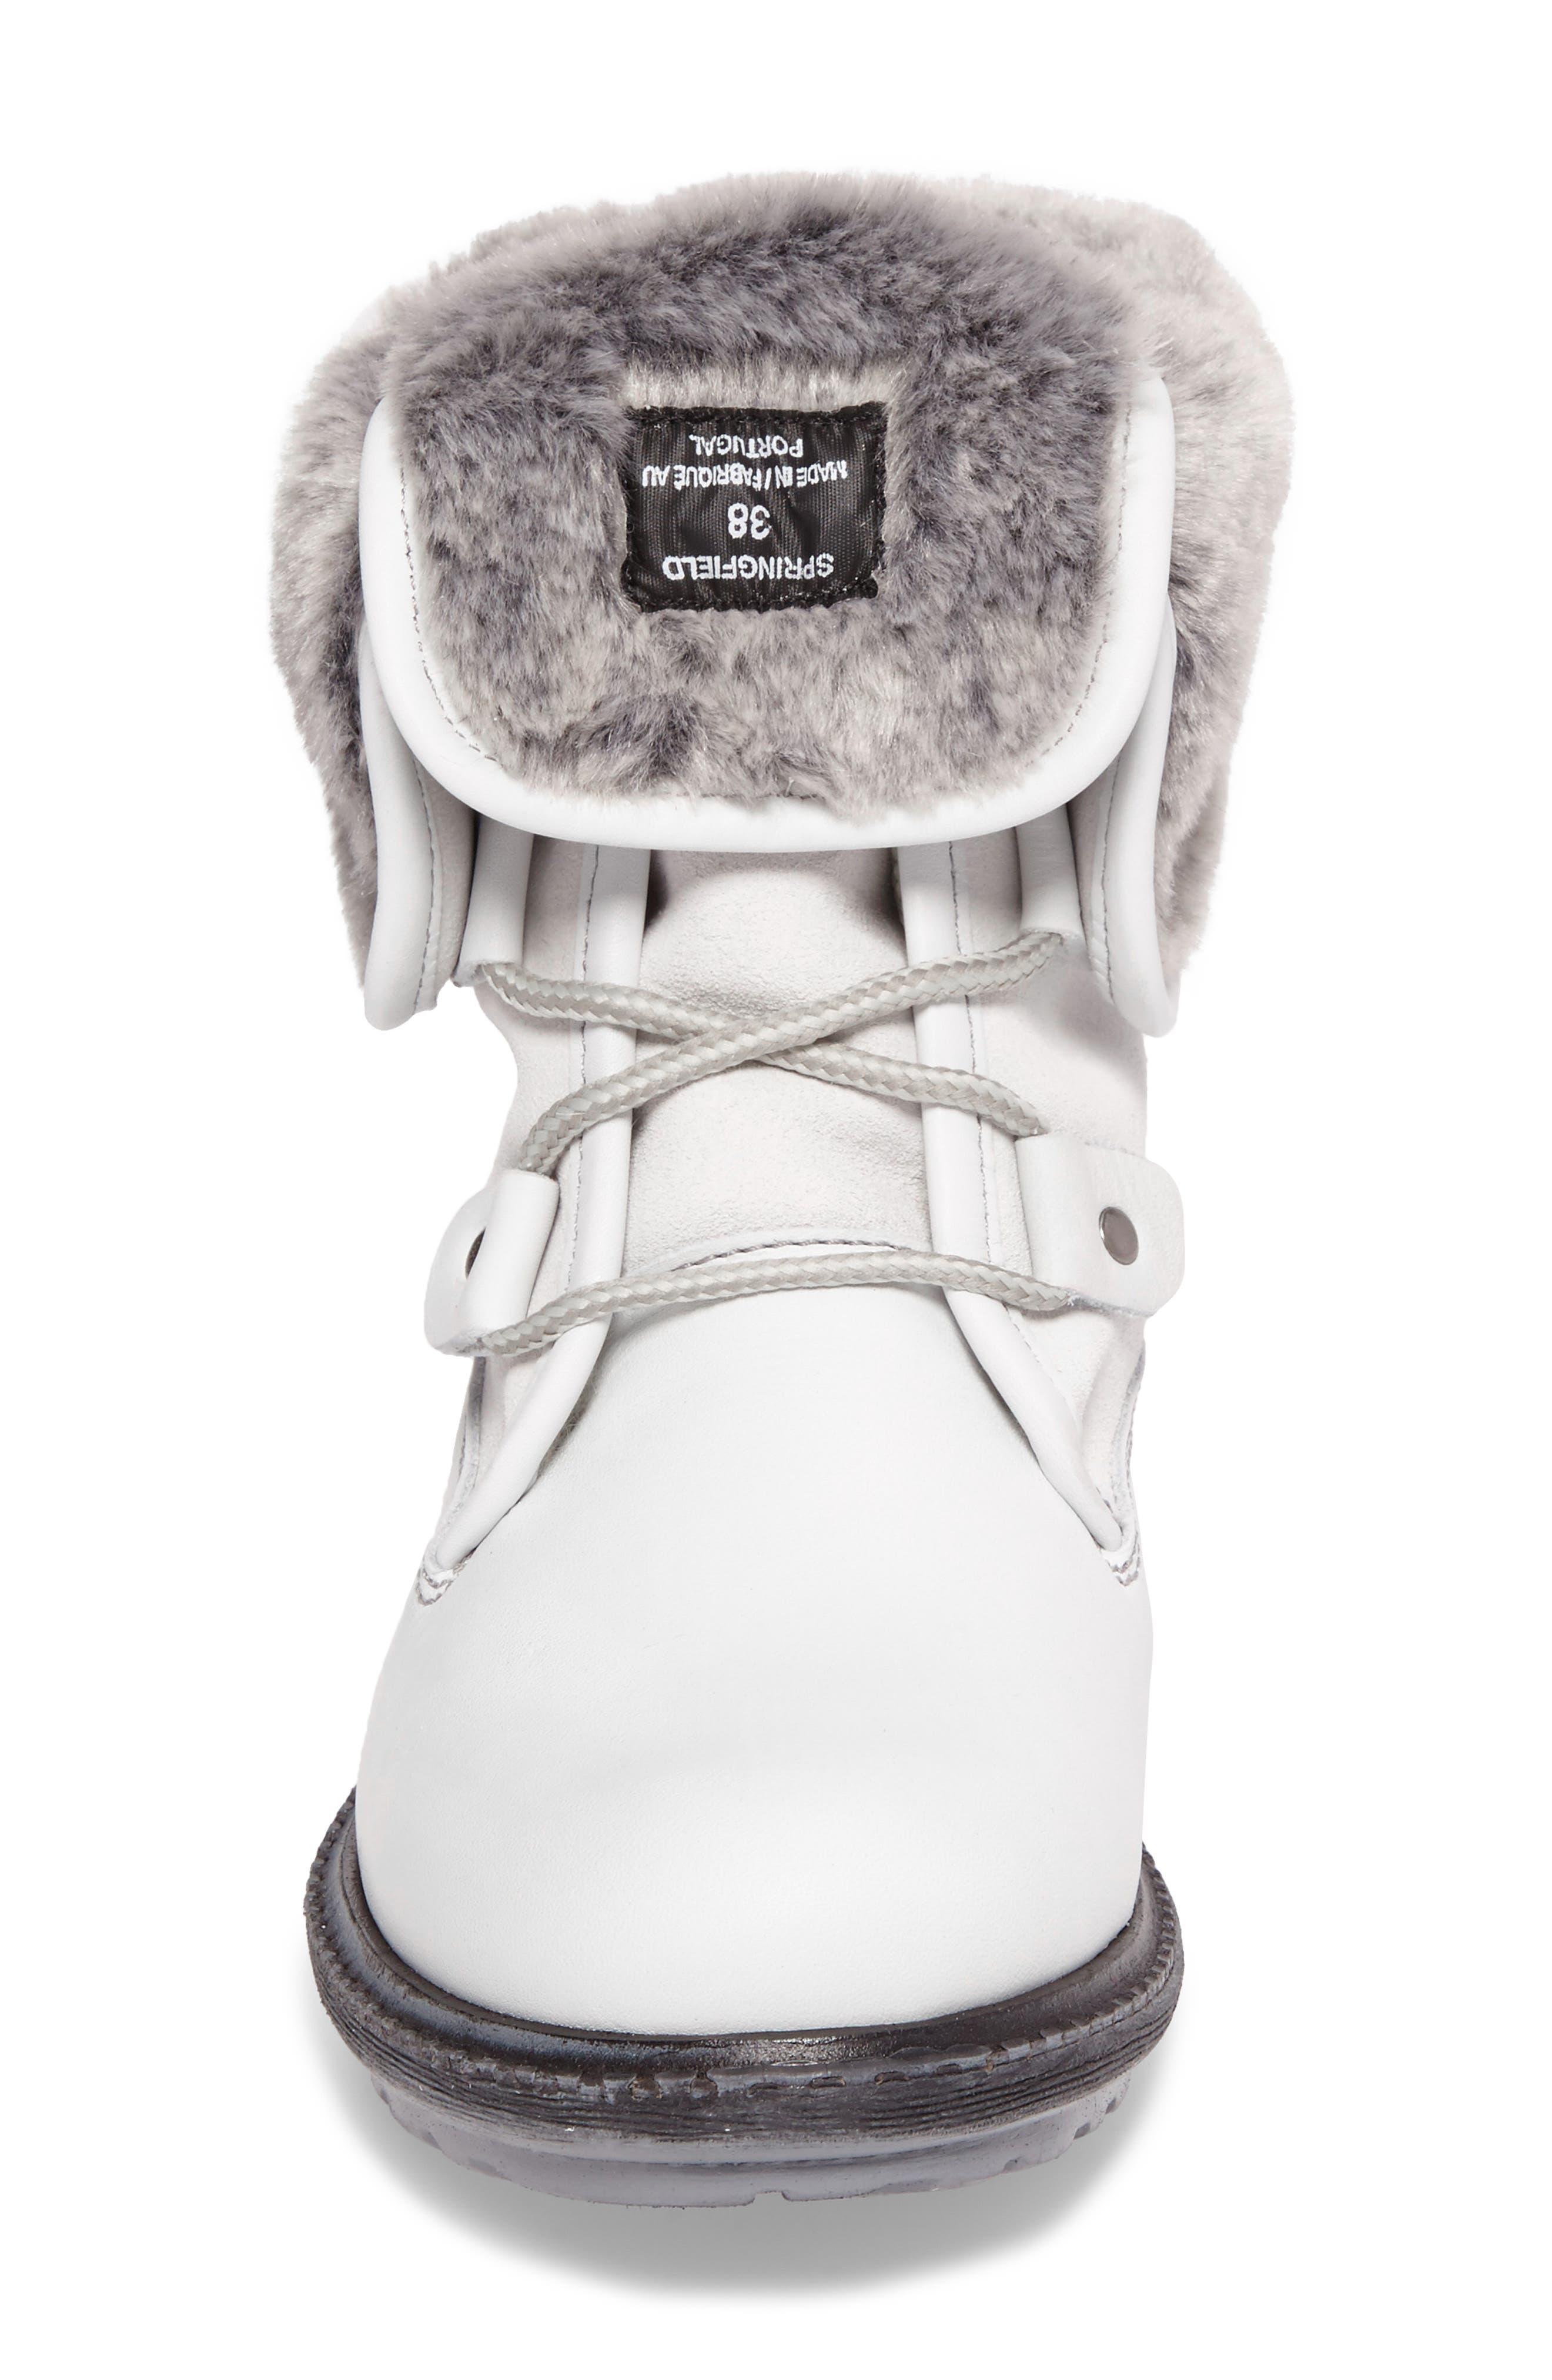 Springfield Waterproof Winter Boot,                             Alternate thumbnail 4, color,                             White/ Grey/ Black